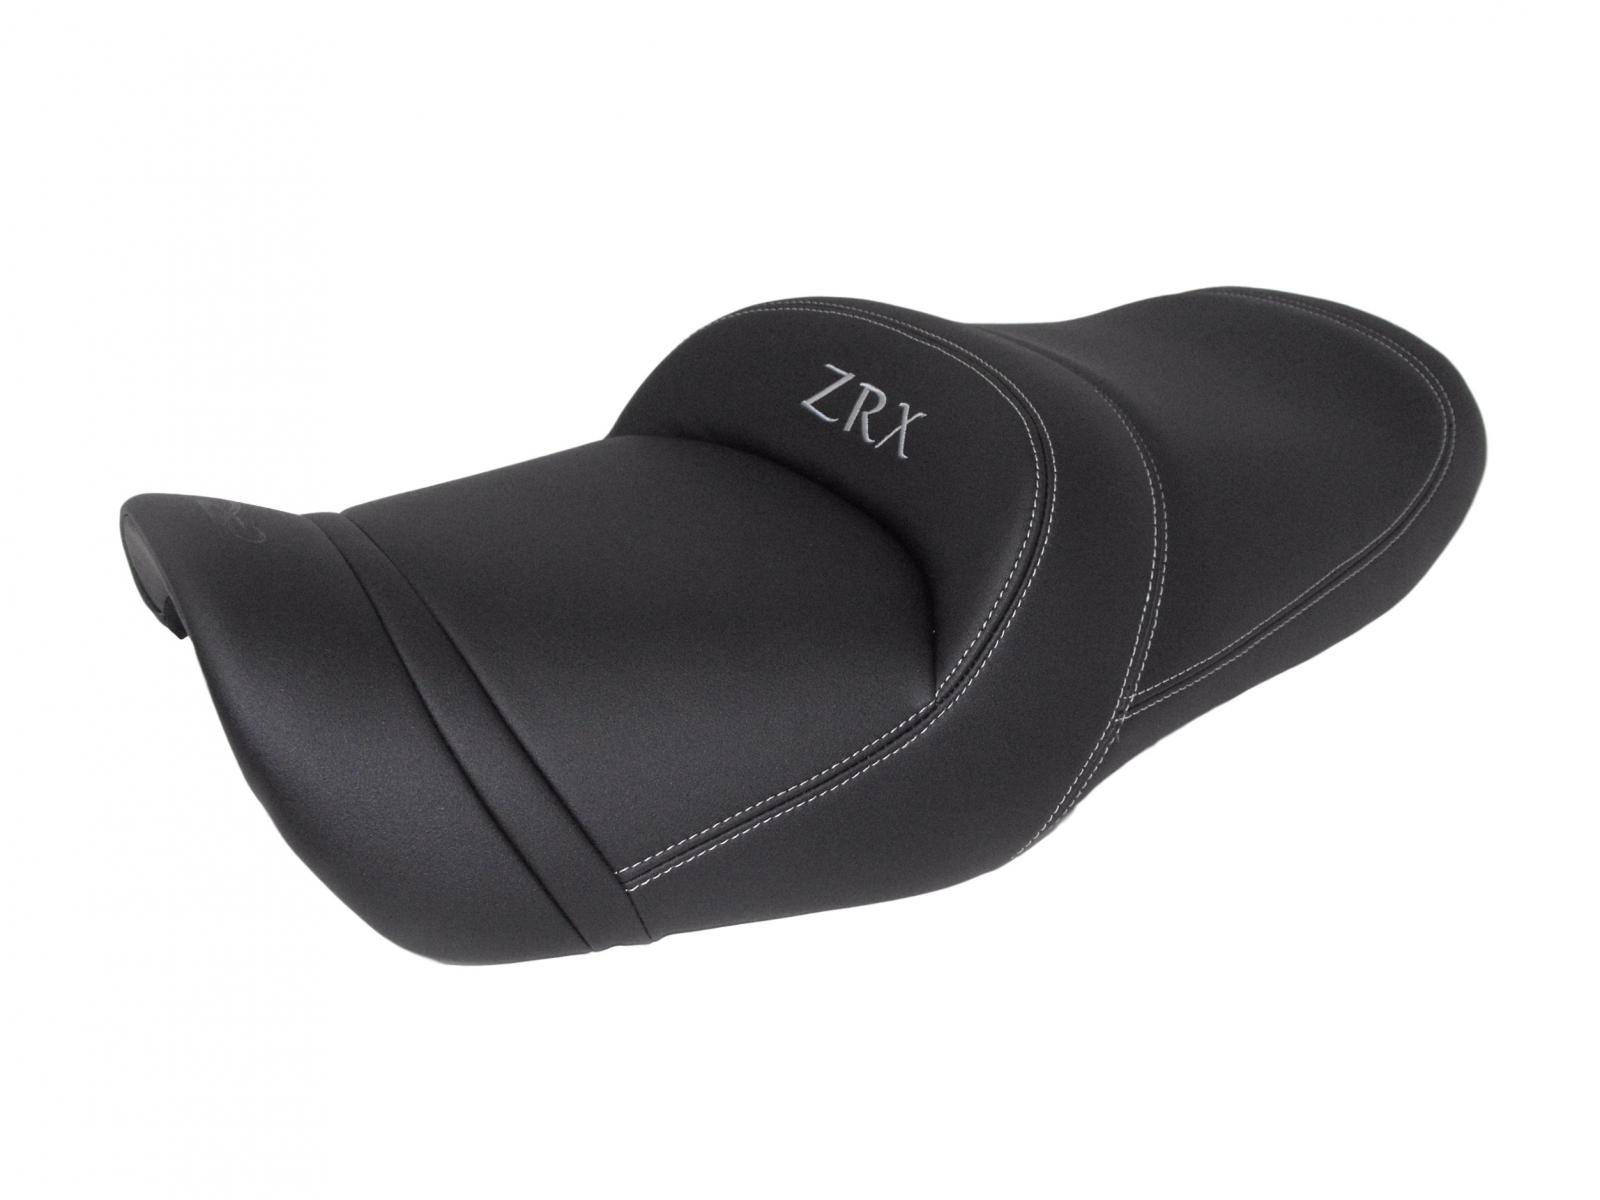 Sella Grande Confort SGC4753 - KAWASAKI ZRX 1200 S/R [≥ 2001]